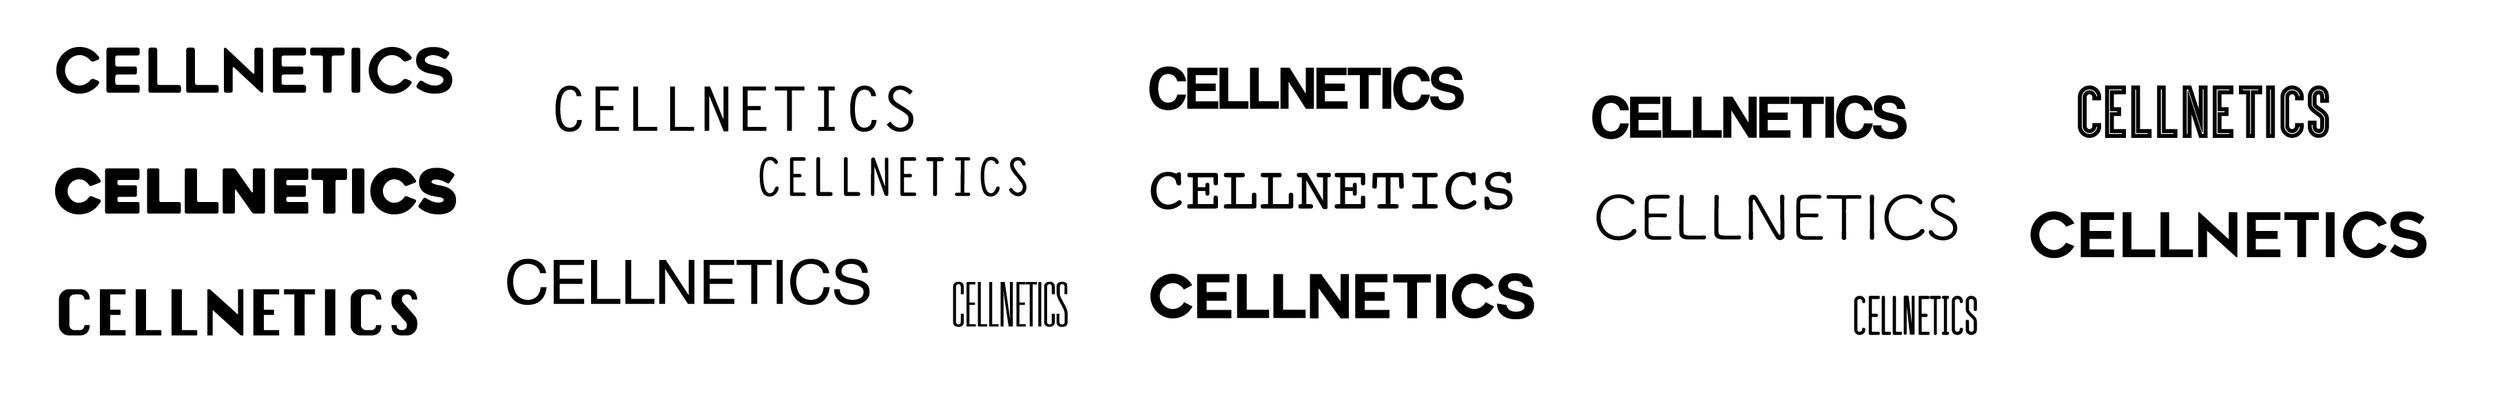 cellnetics web-01.png